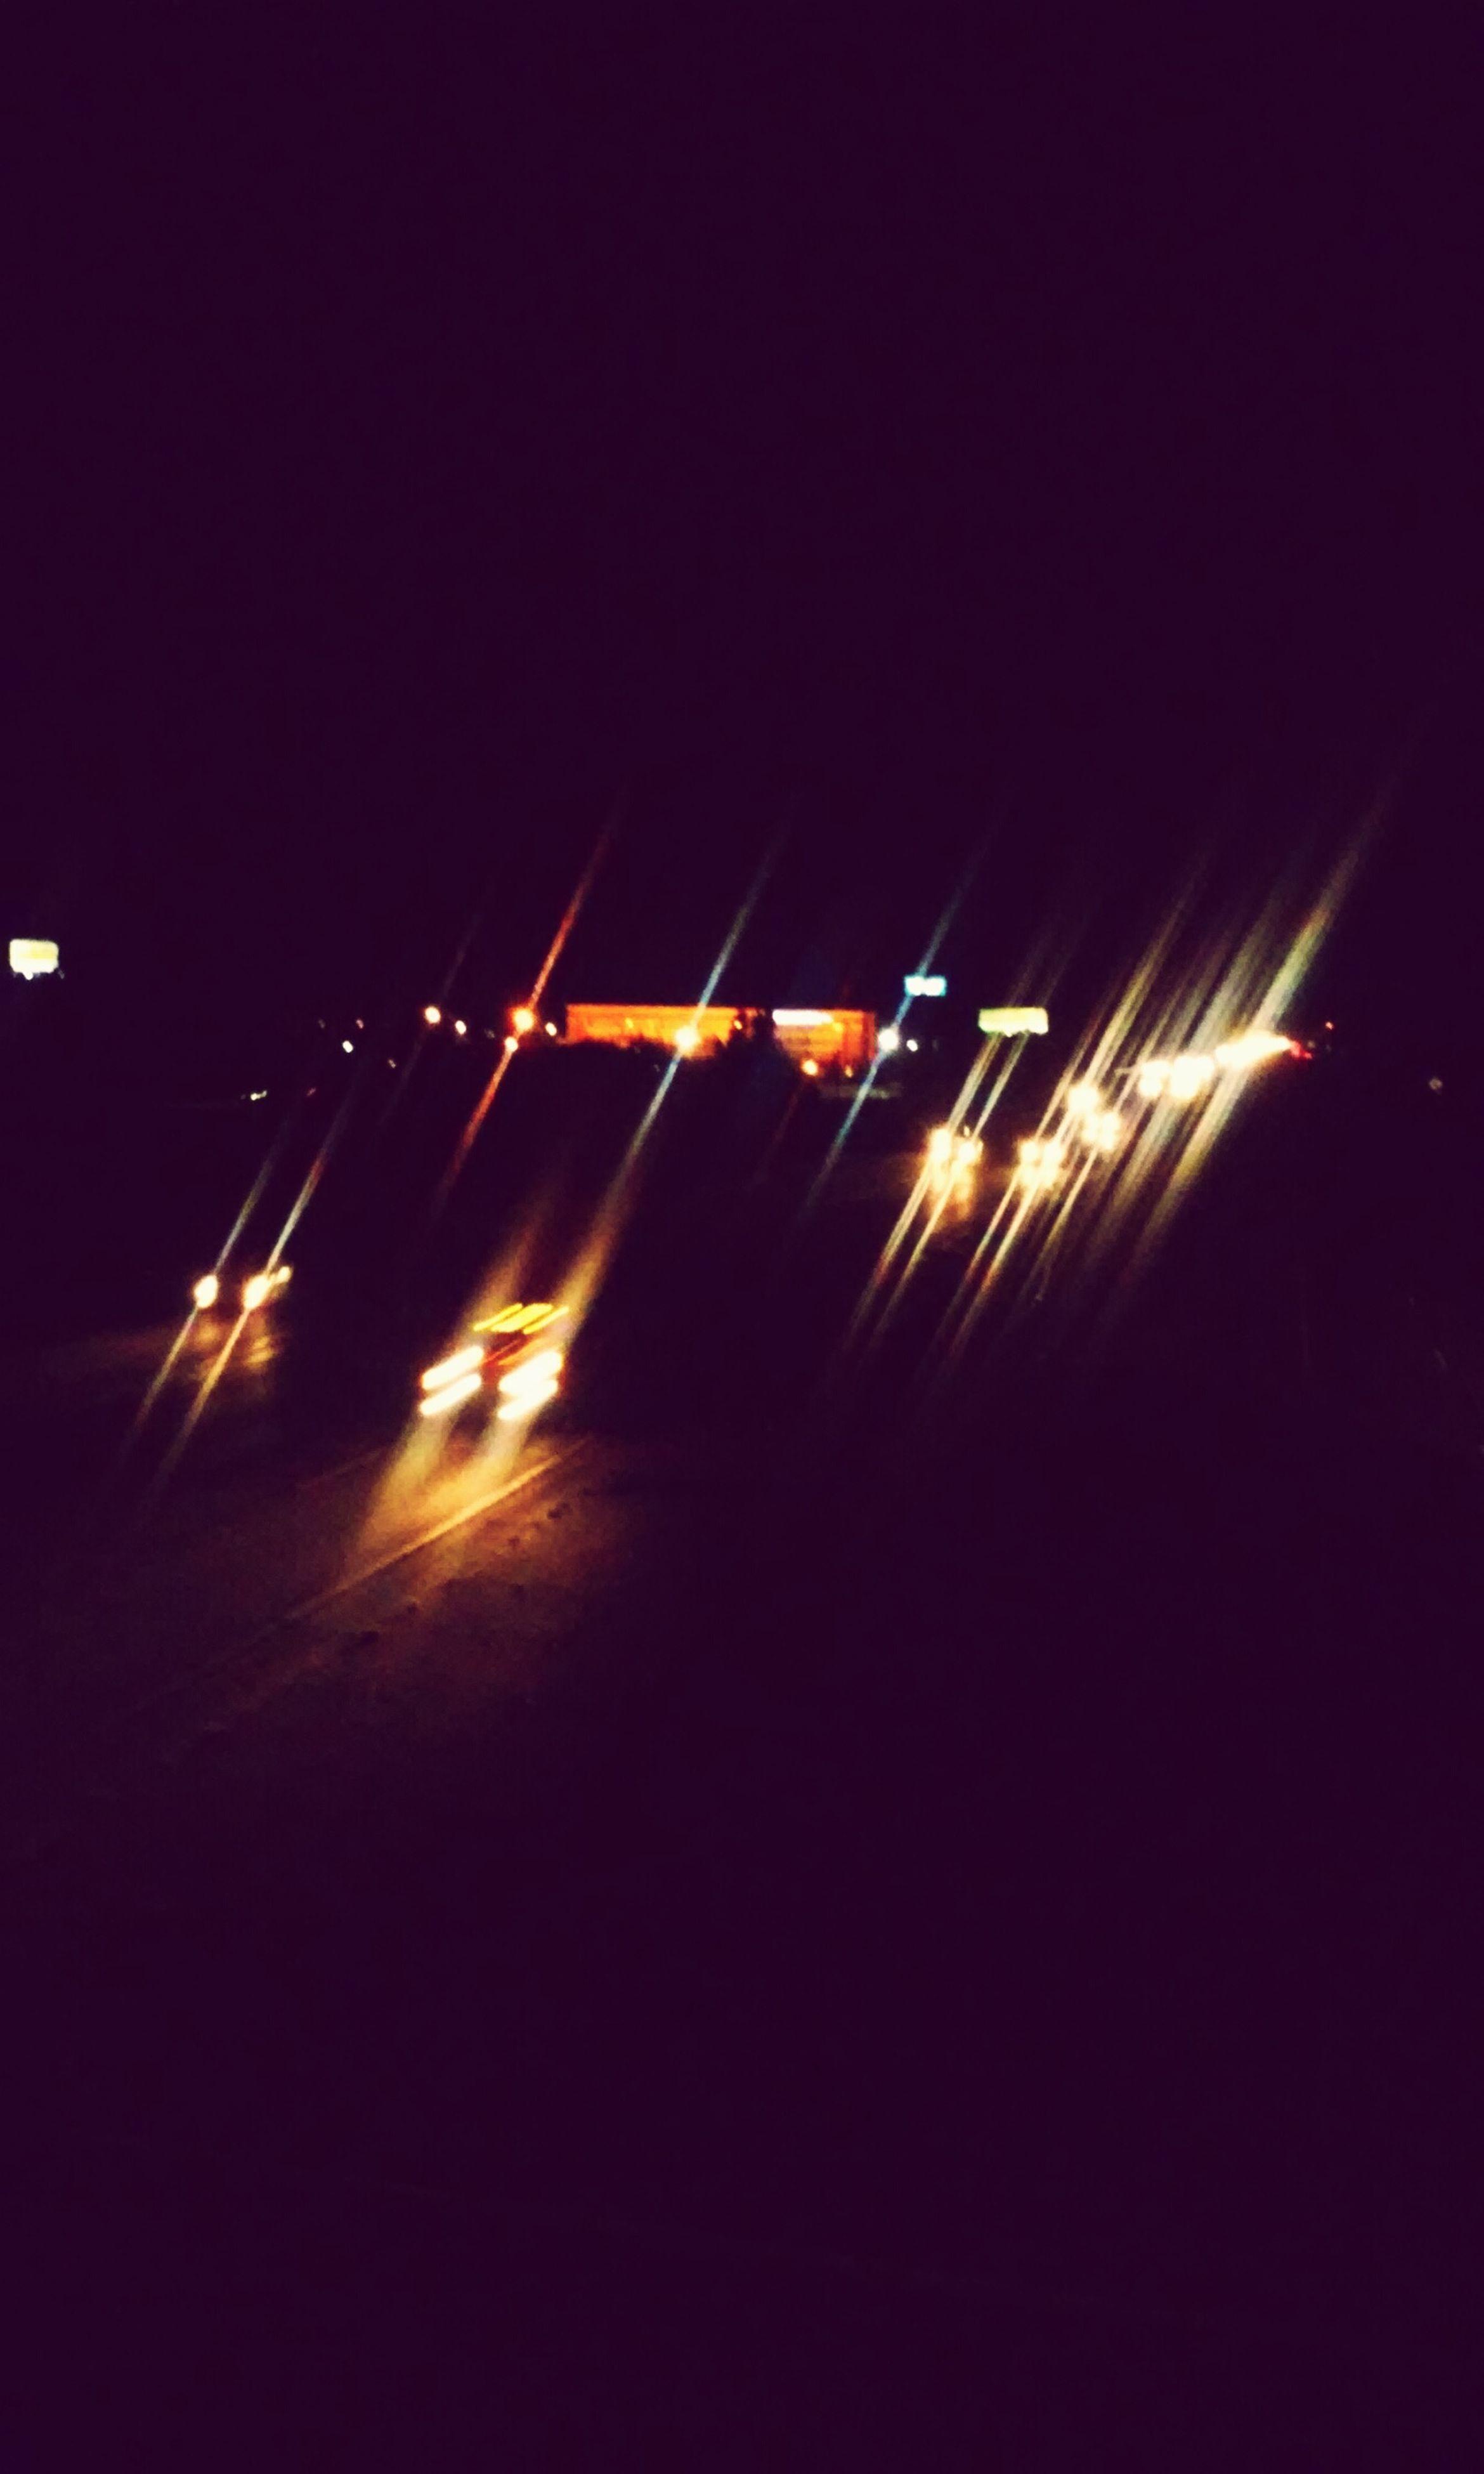 illuminated, night, long exposure, lighting equipment, motion, blurred motion, light trail, glowing, dark, outdoors, light beam, event, firework - man made object, tail light